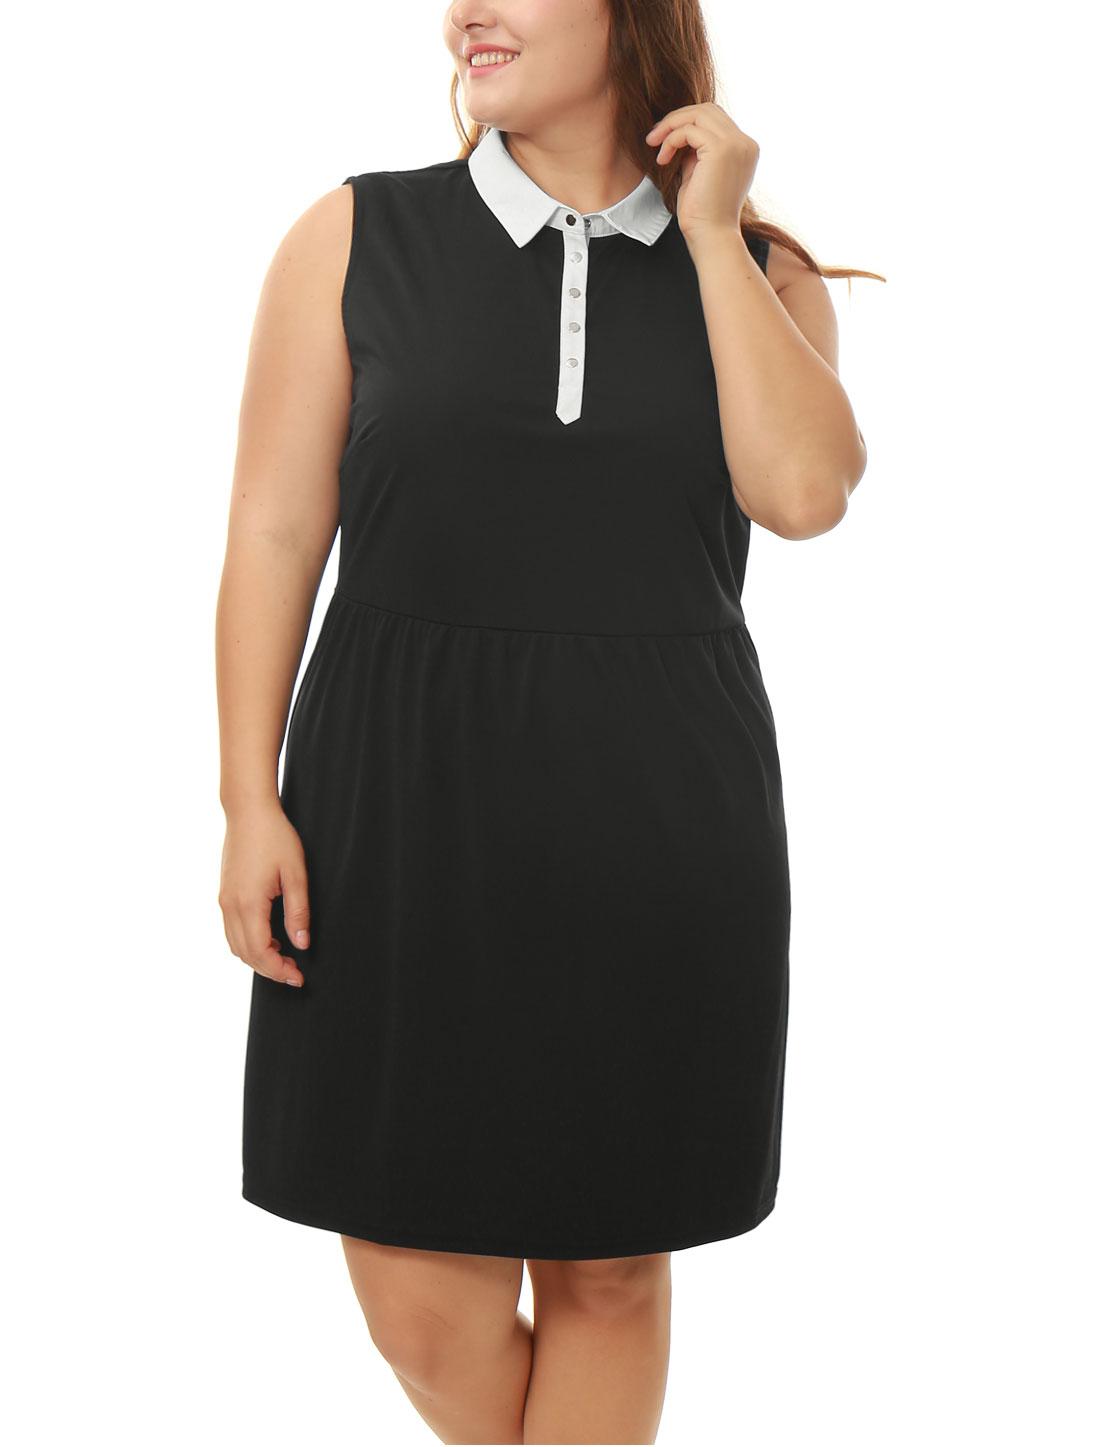 Women Plus Size Sleeveless Contrast-Collared A Line Dress Black 3X